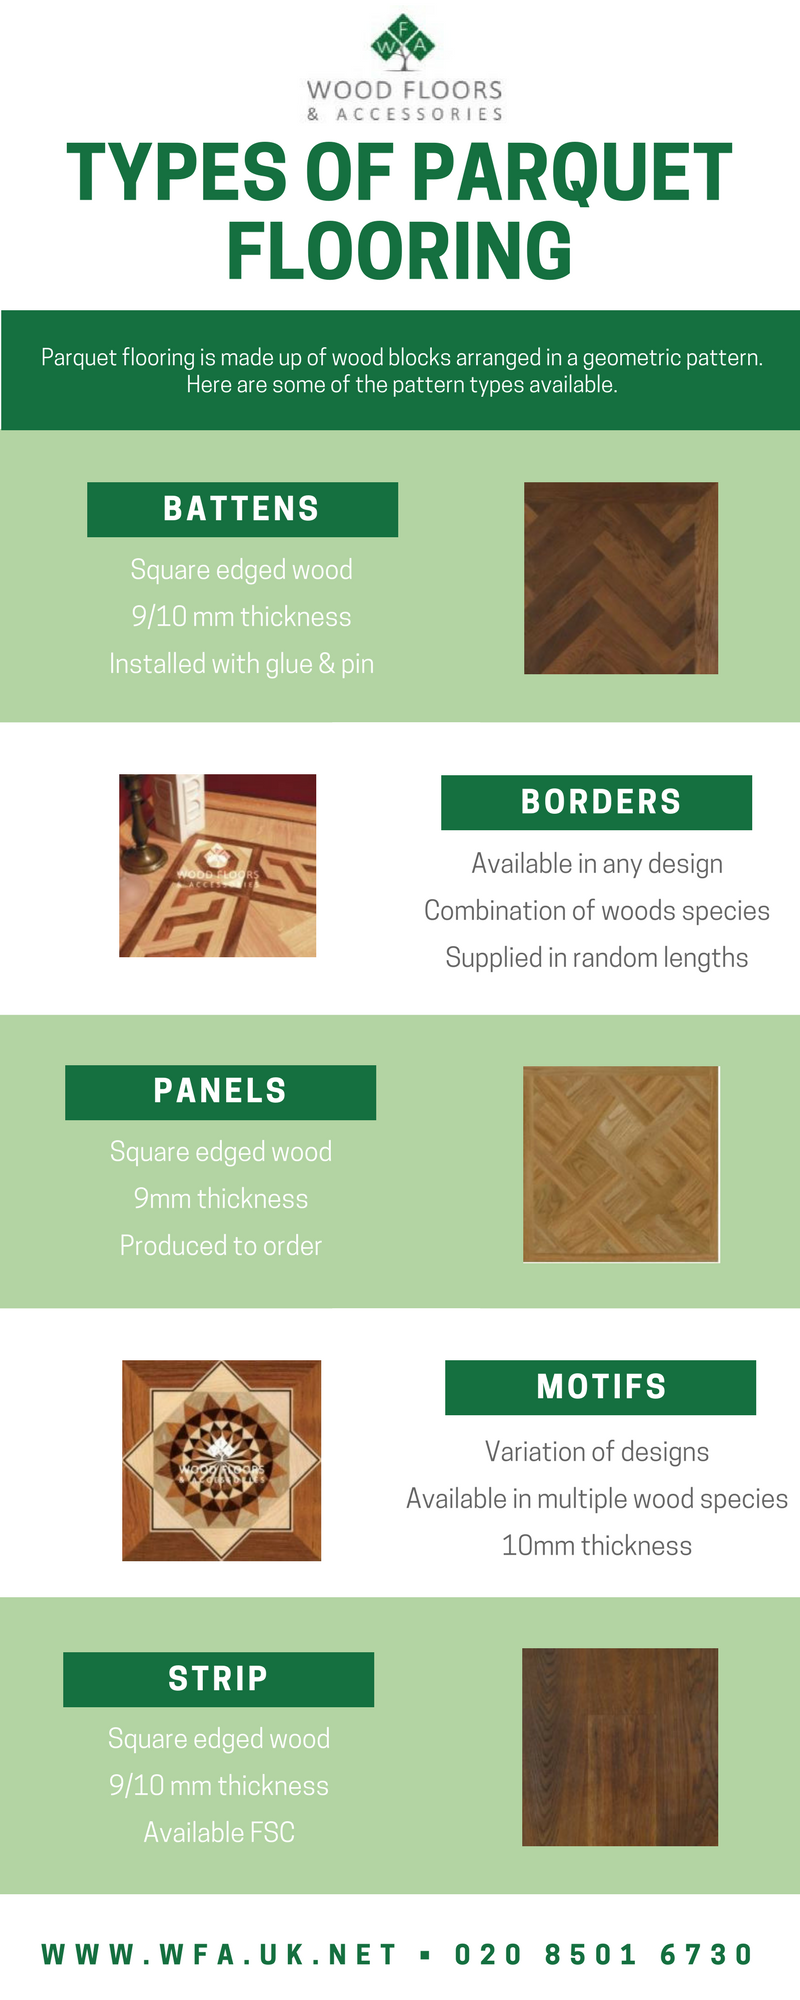 parquet-floor-types-infographic-lkrllc